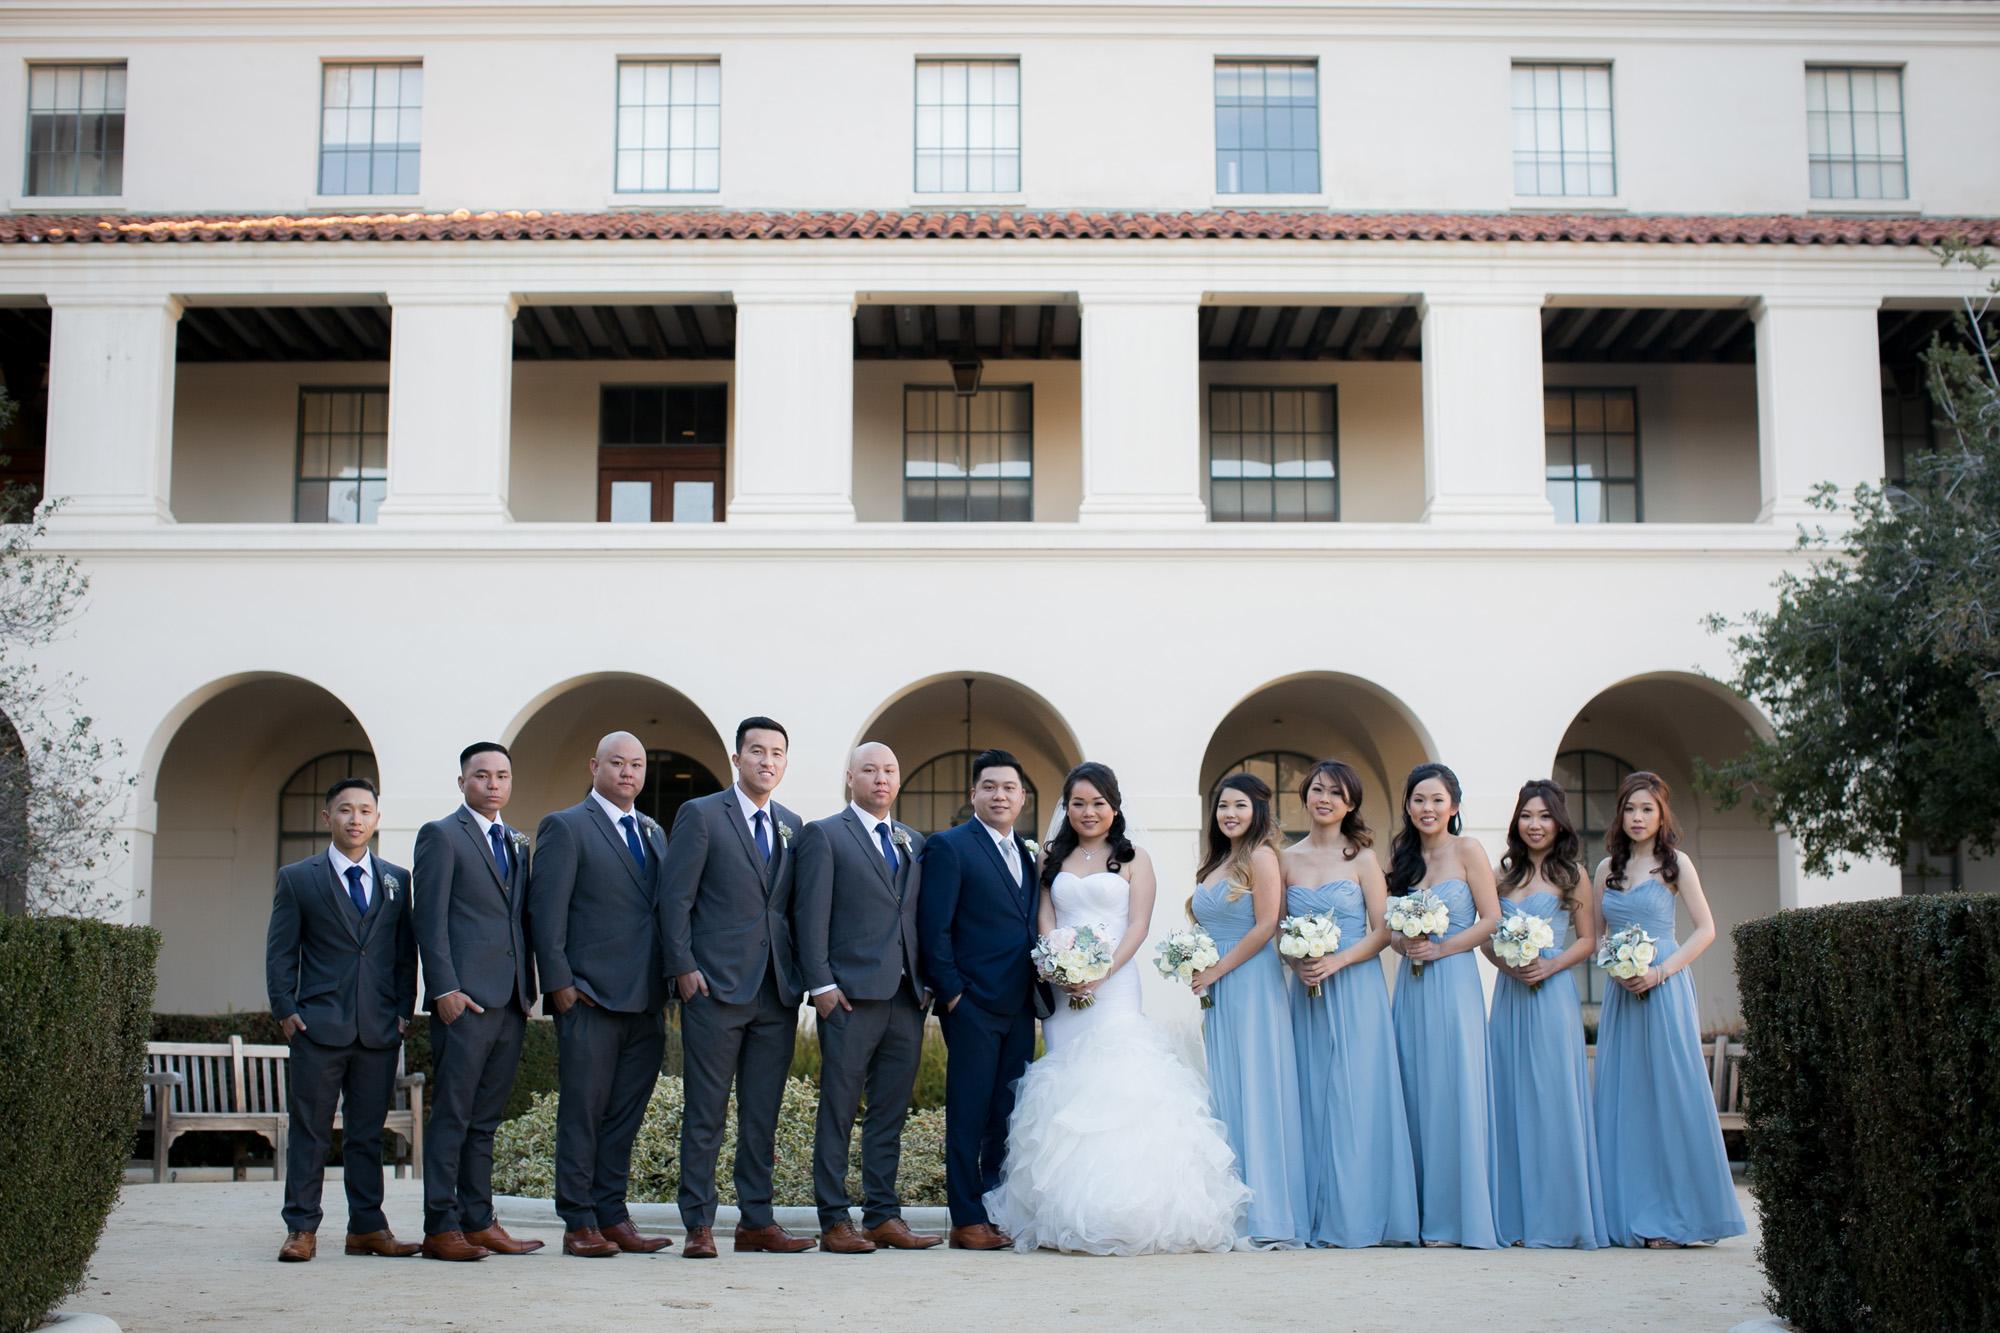 Geoff Kowalchuk JT Wedding Photo-013.jpg